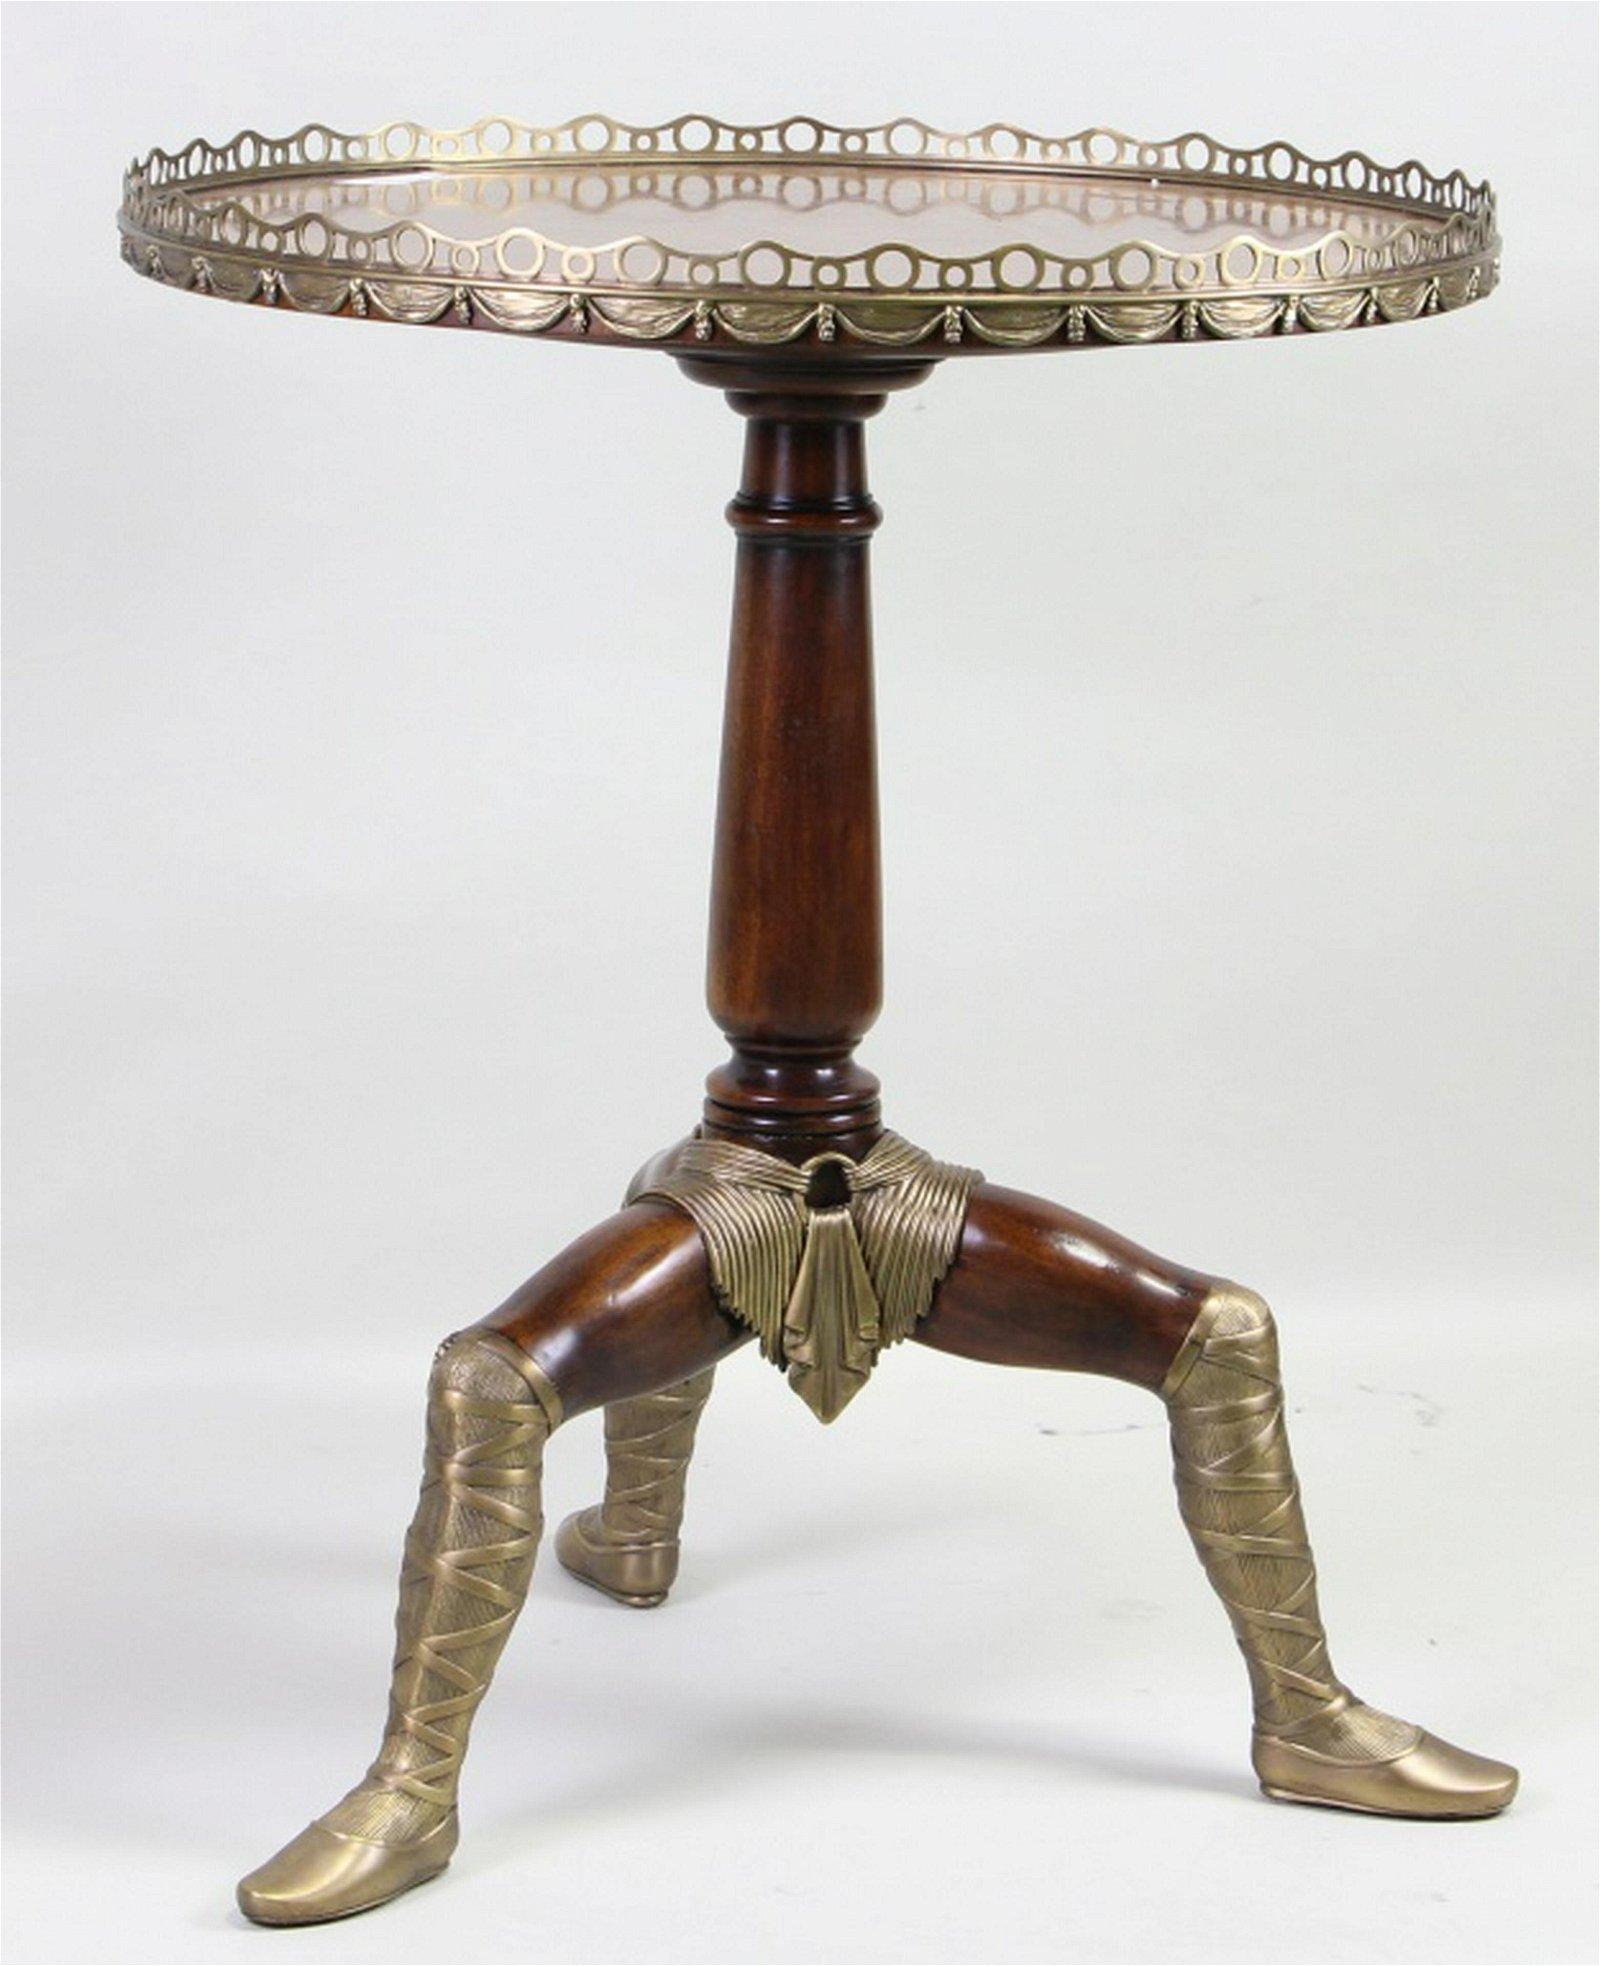 THEODORE ALEXANDER GEORGIAN STYLE TRIPOD TABLE